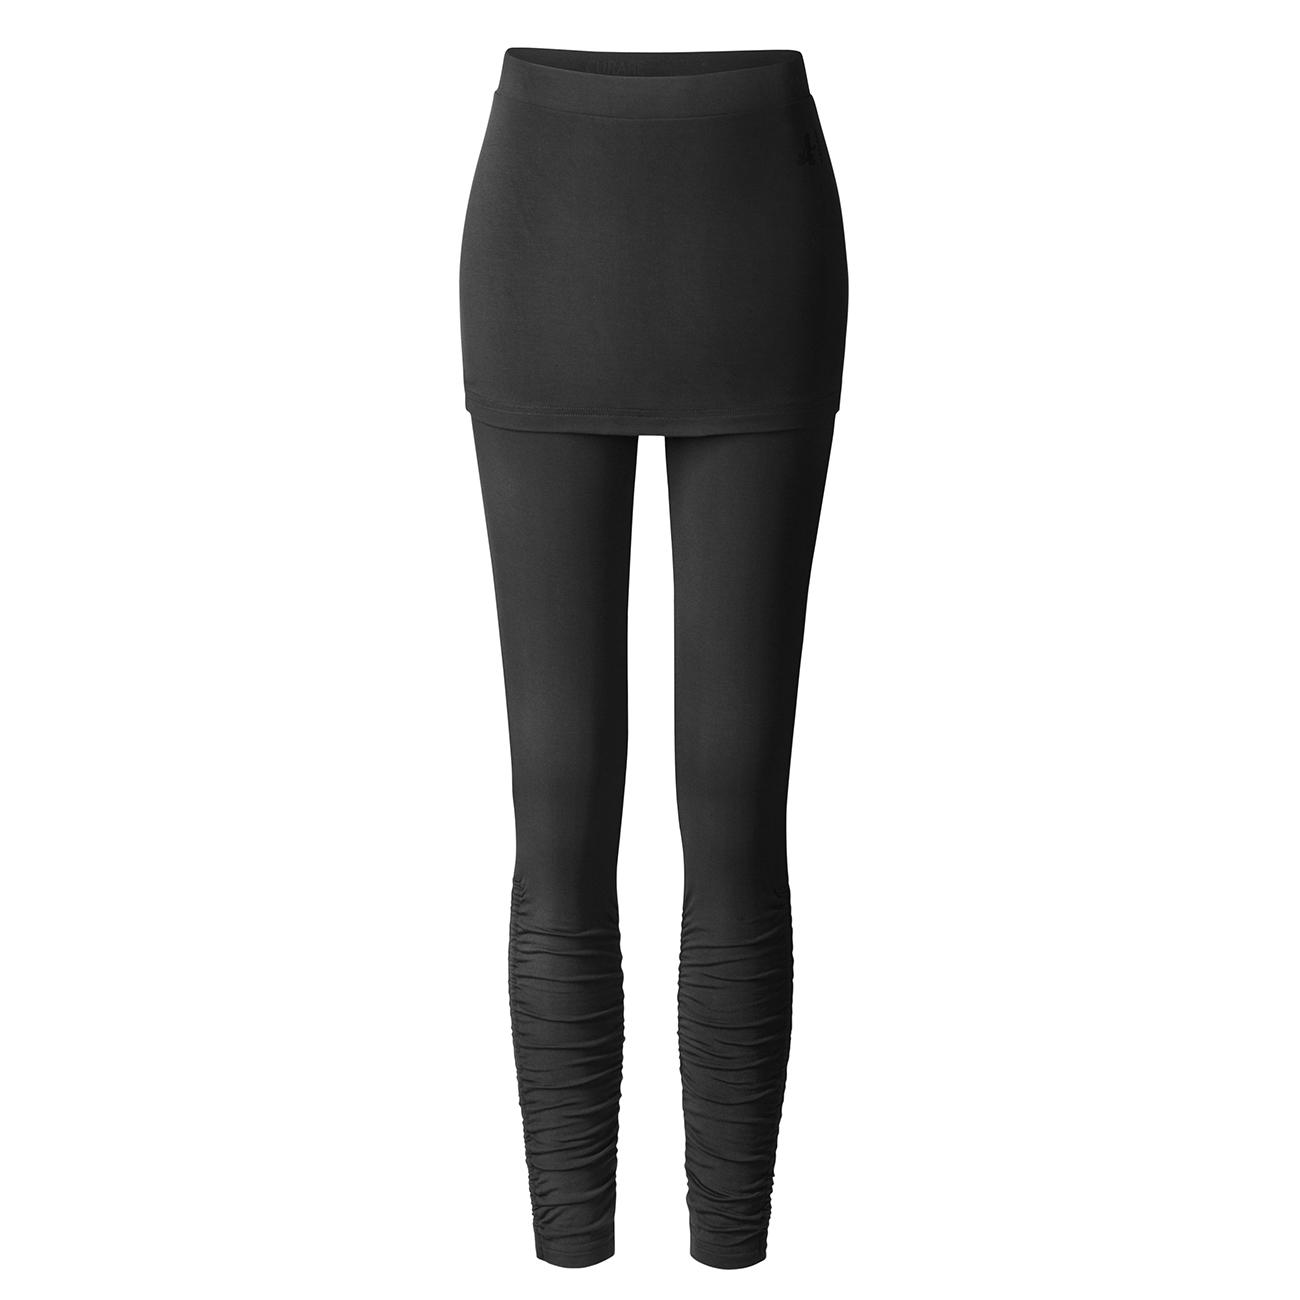 leggings skirt von curare black yoga leggings damen. Black Bedroom Furniture Sets. Home Design Ideas